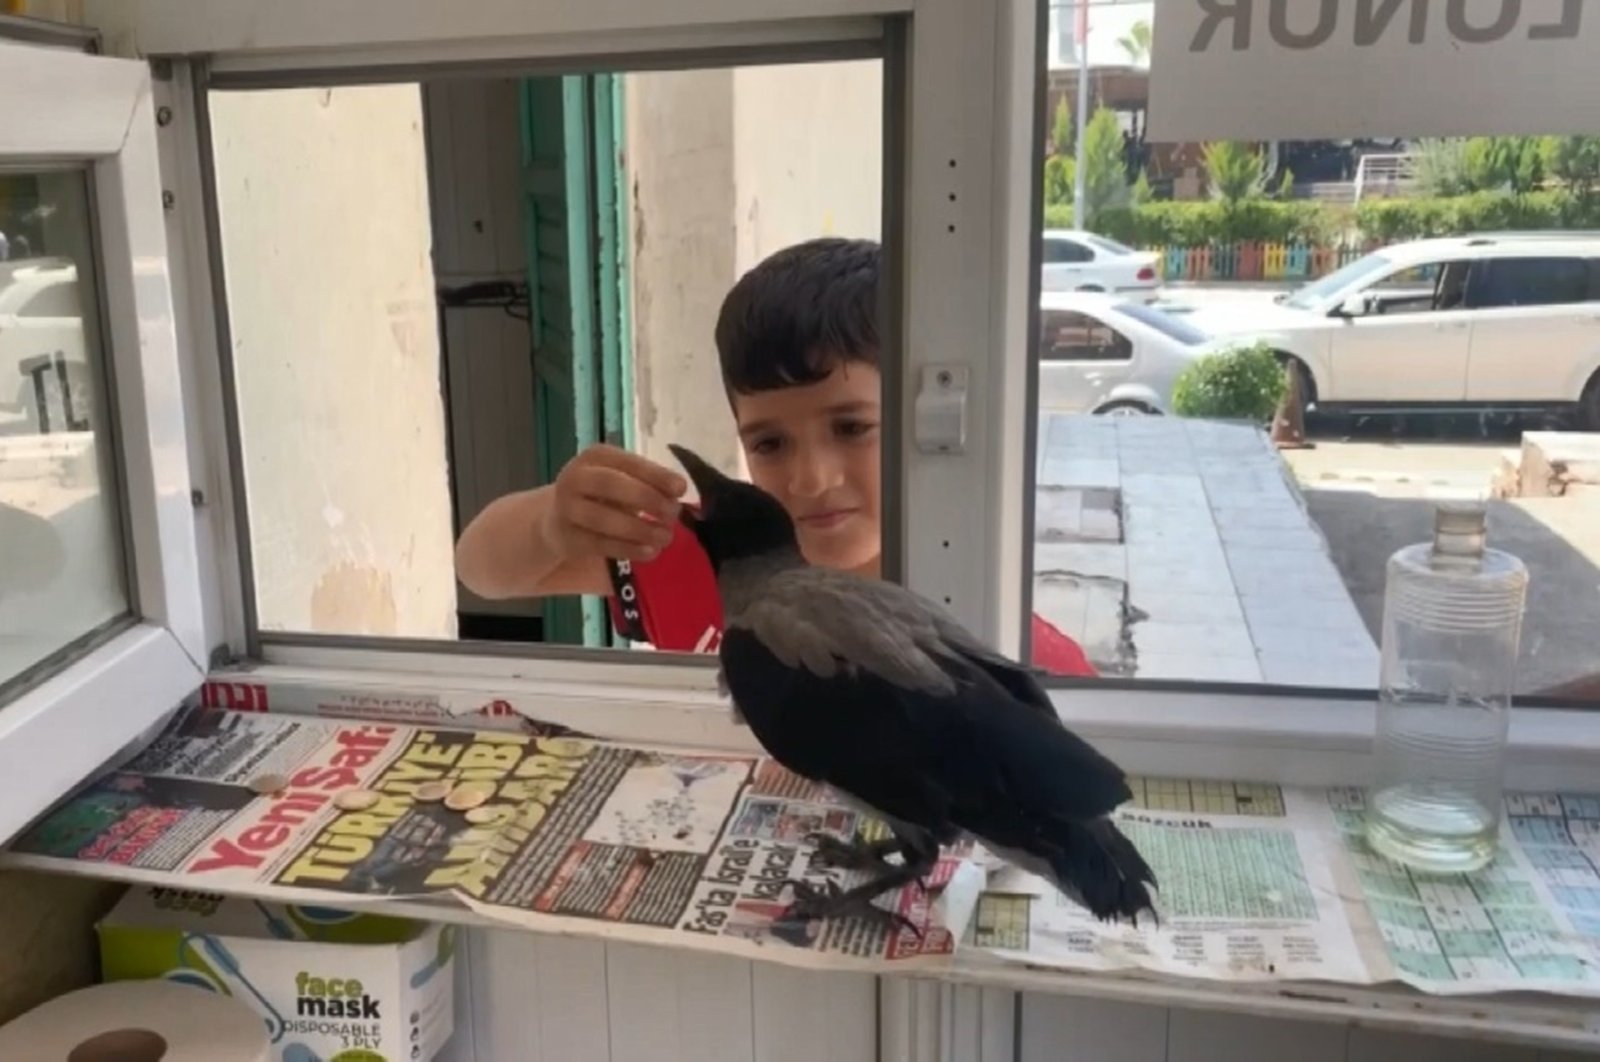 A boy hands money to the crow standing inside the restroom attendant's booth, in Şanlıurfa, southeastern Turkey, June 28, 2021. (IHA PHOTO)